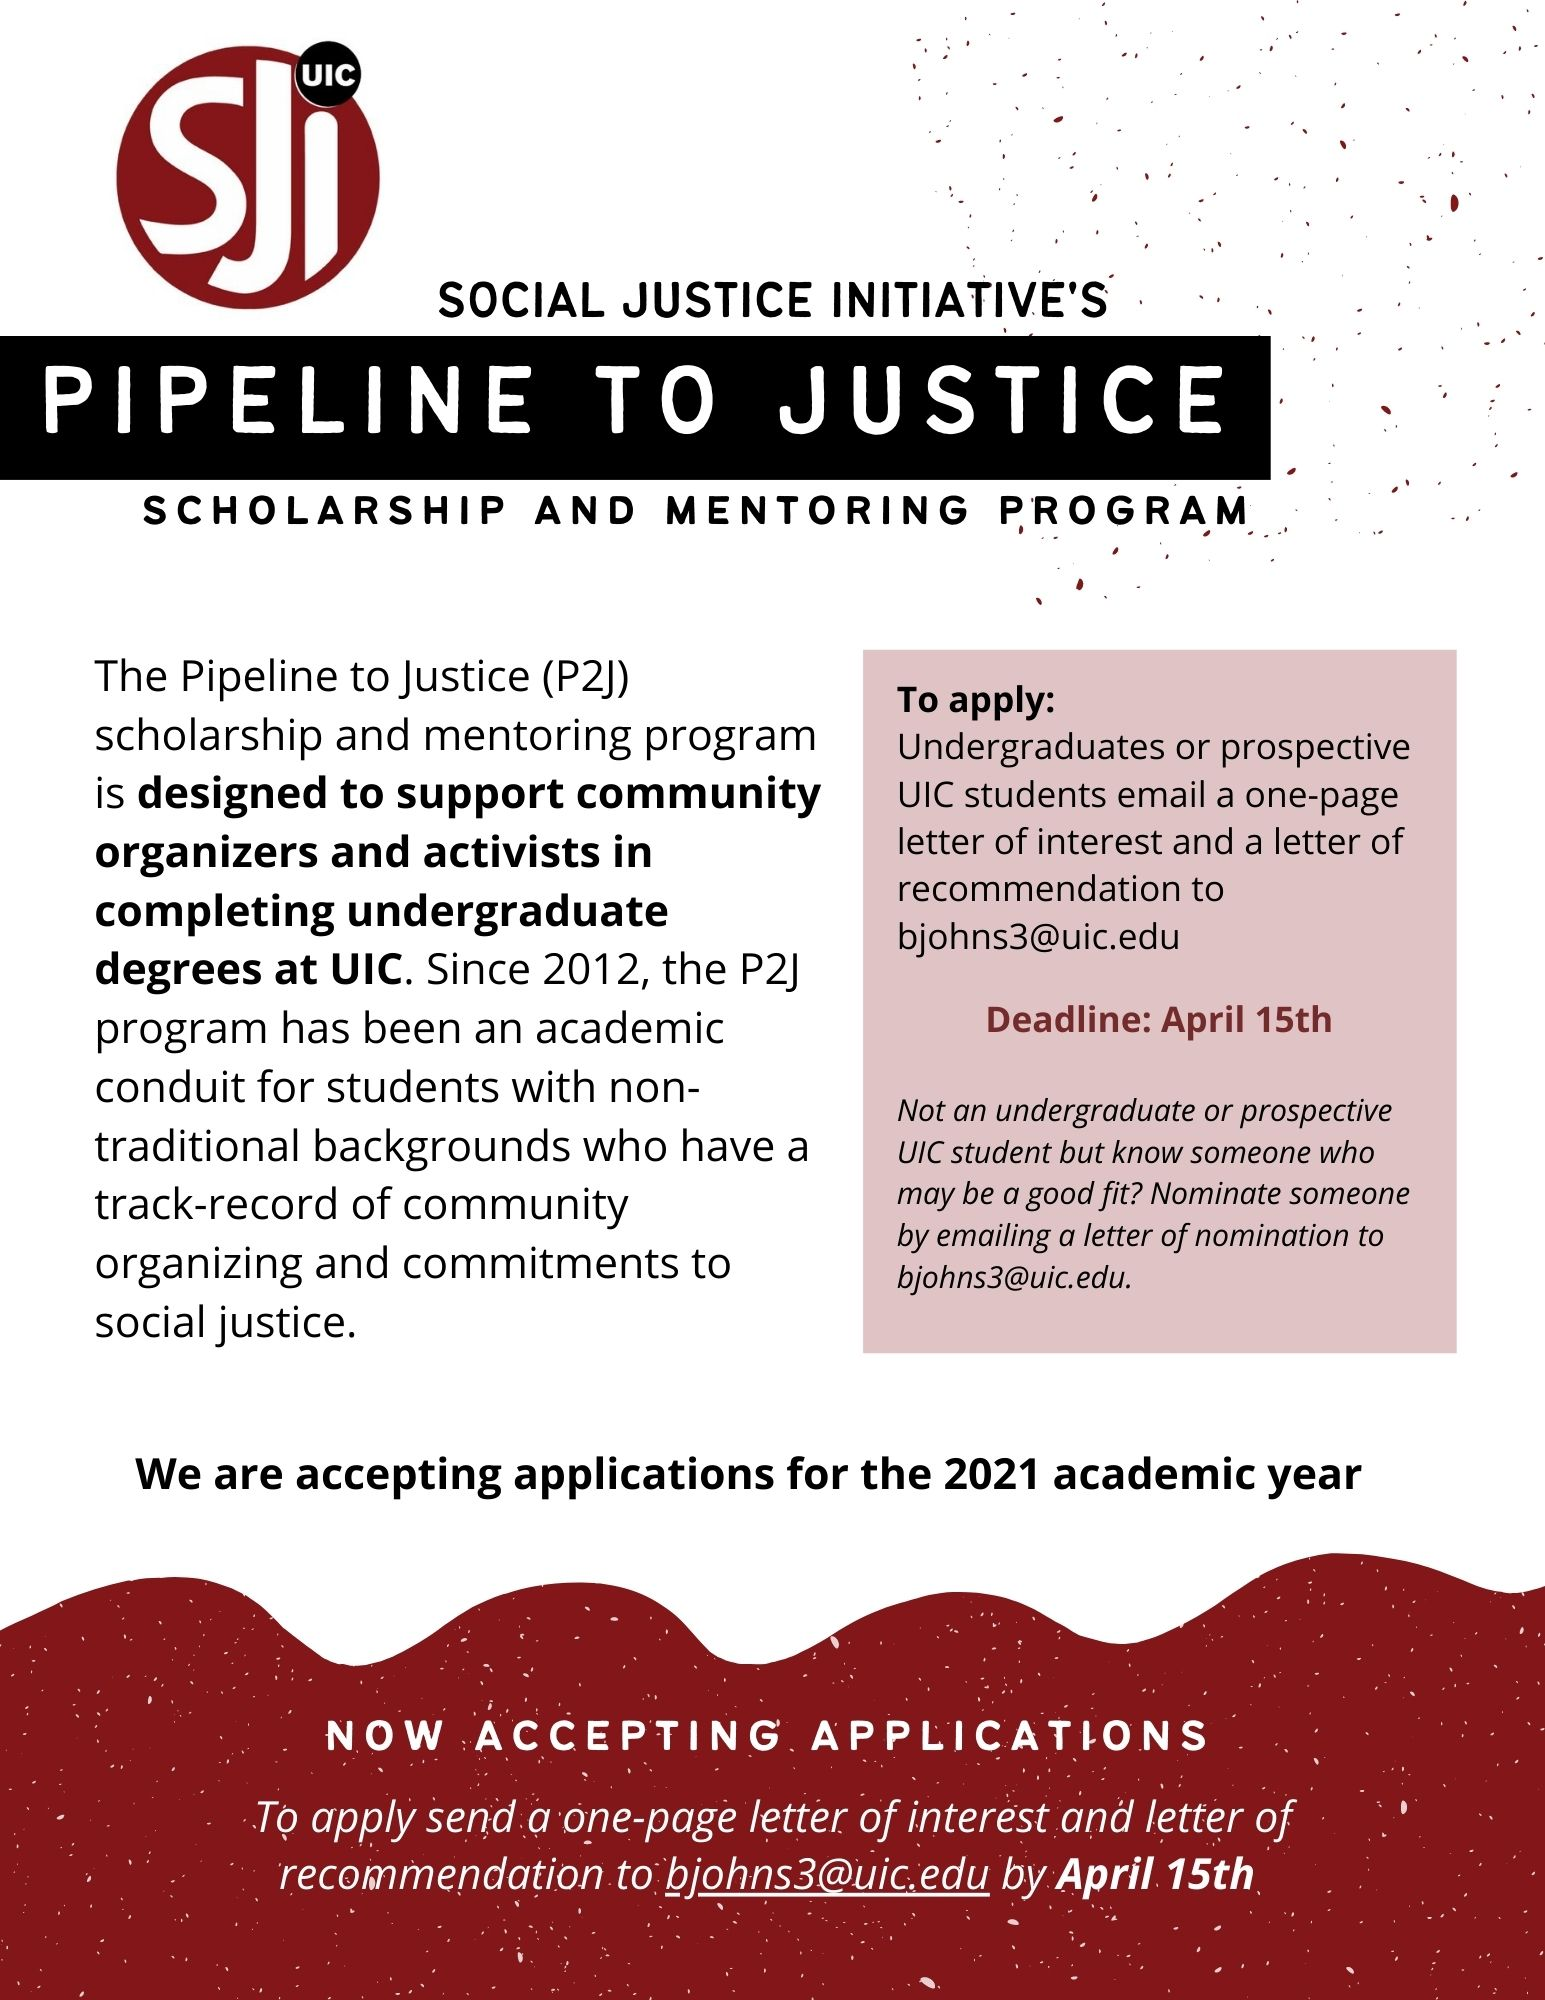 Pipeline to Justice Scholarship and Mentoring Program for UIC Undergraduates and prospective undergraduates